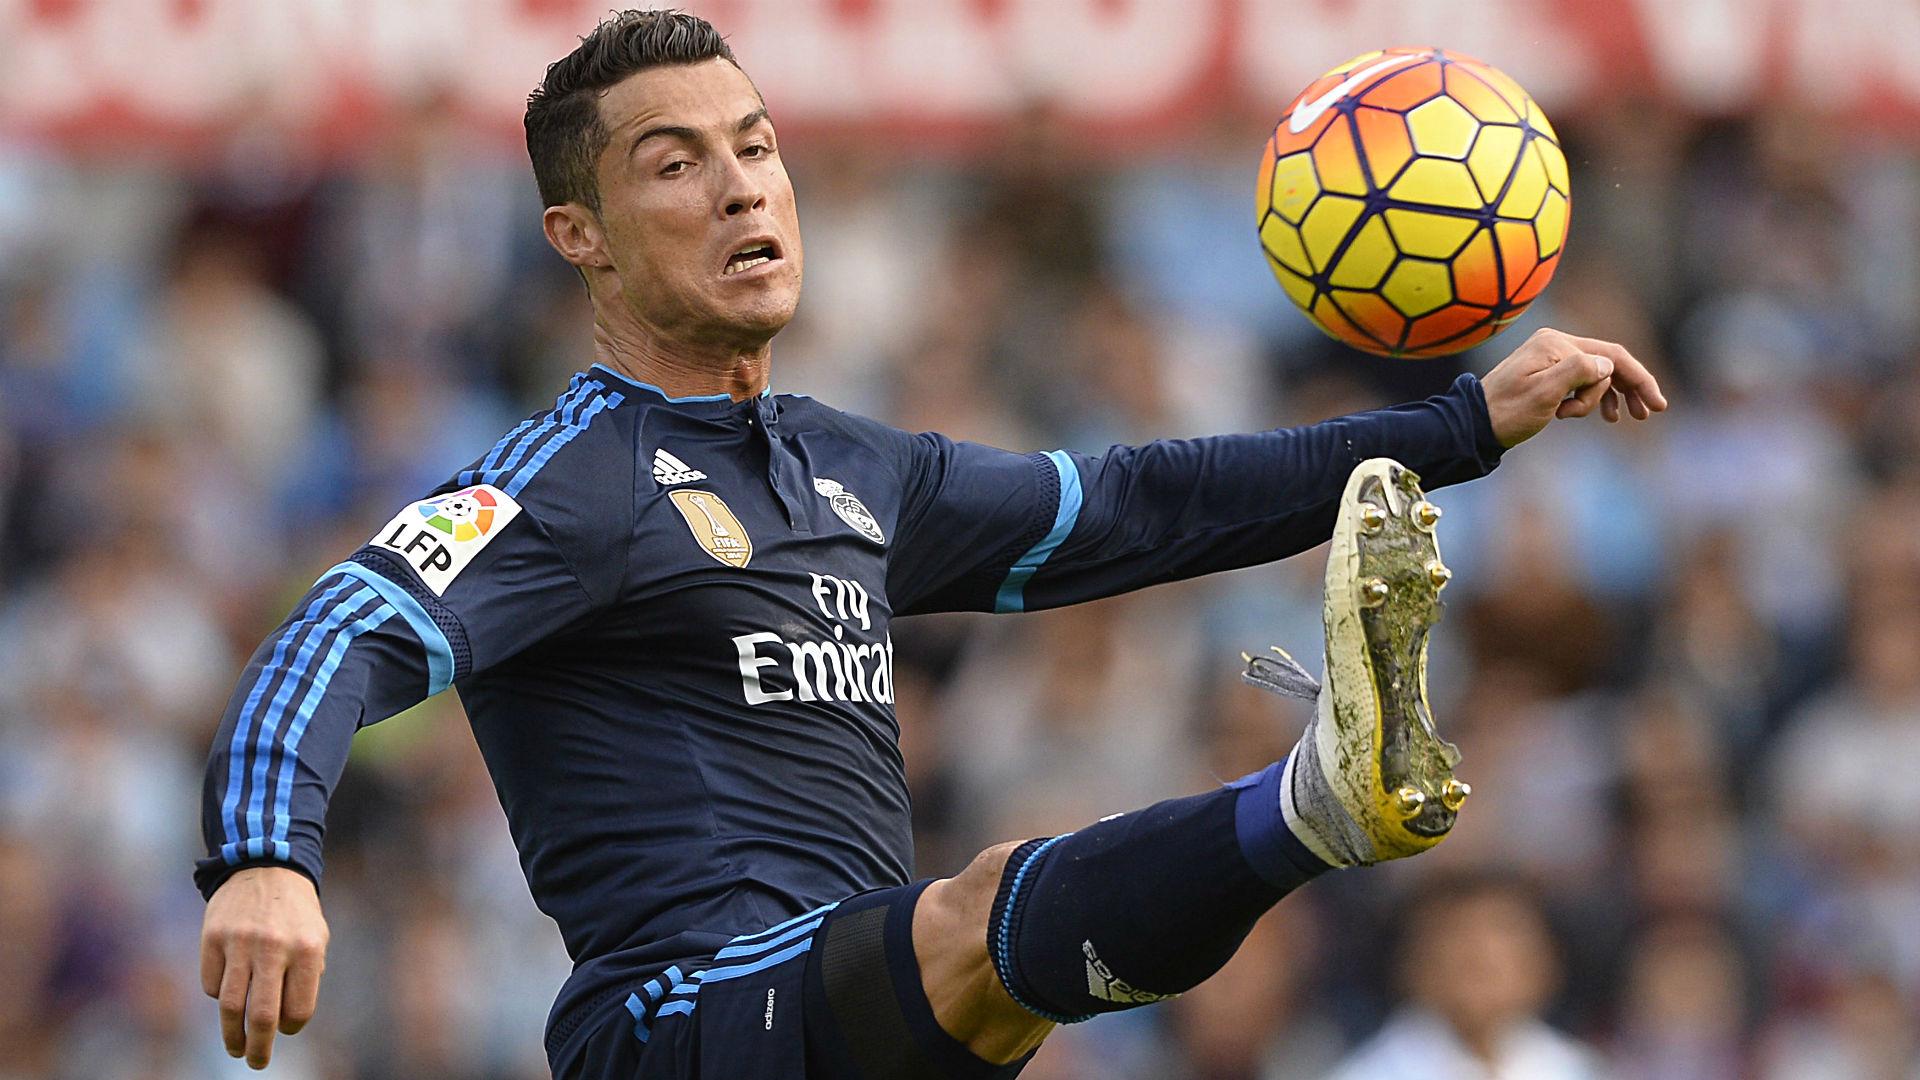 Cristiano-Ronaldo-110615-Getty-FTR.jpg